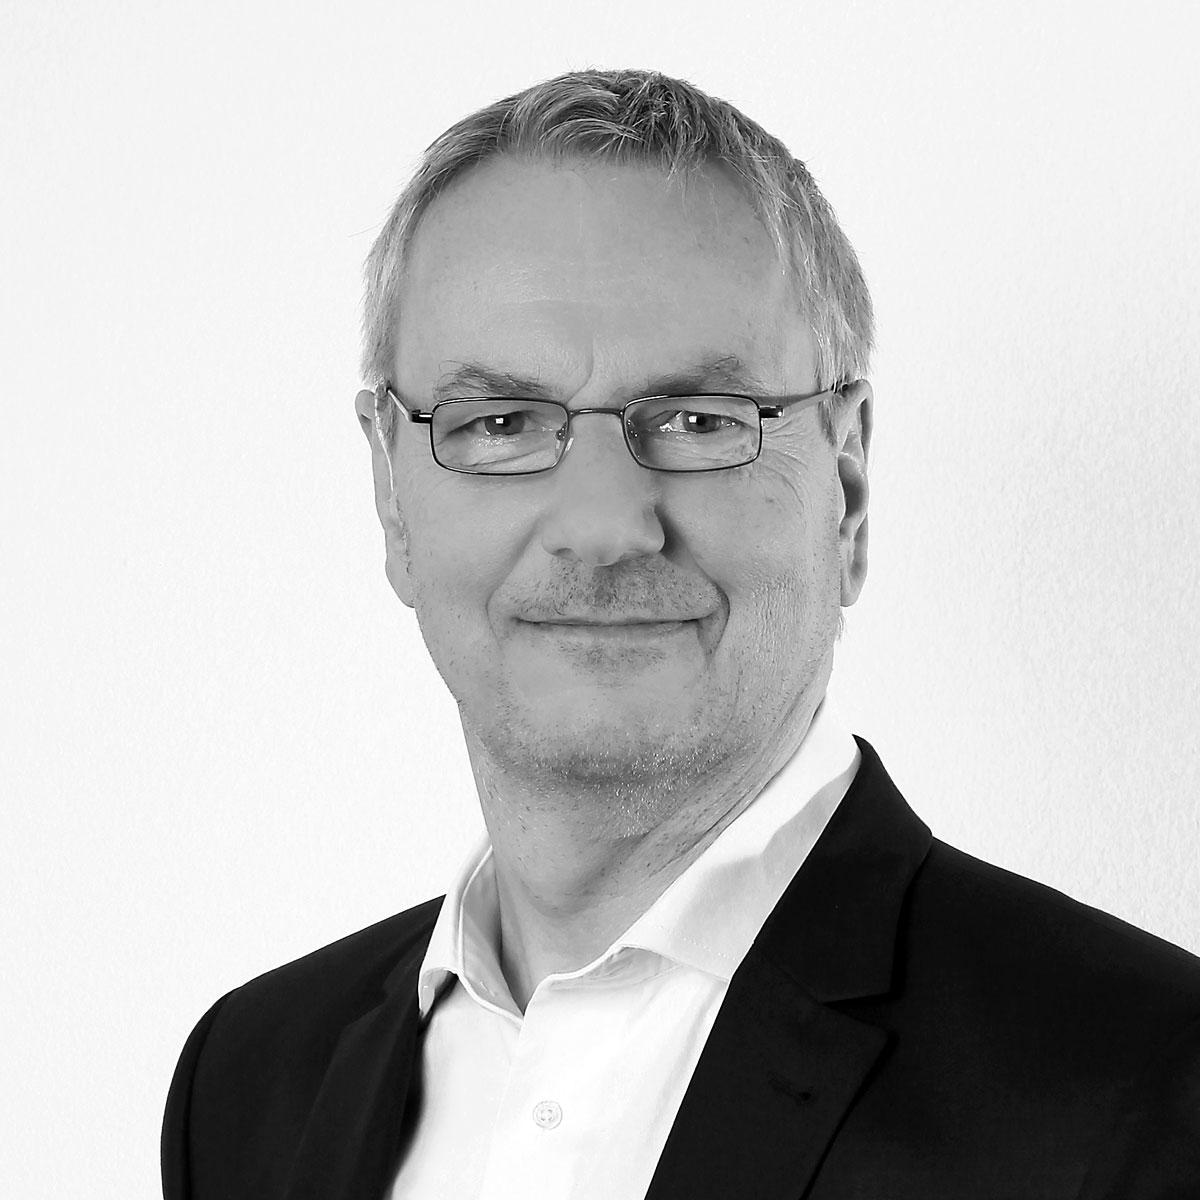 Bernd Stiebel